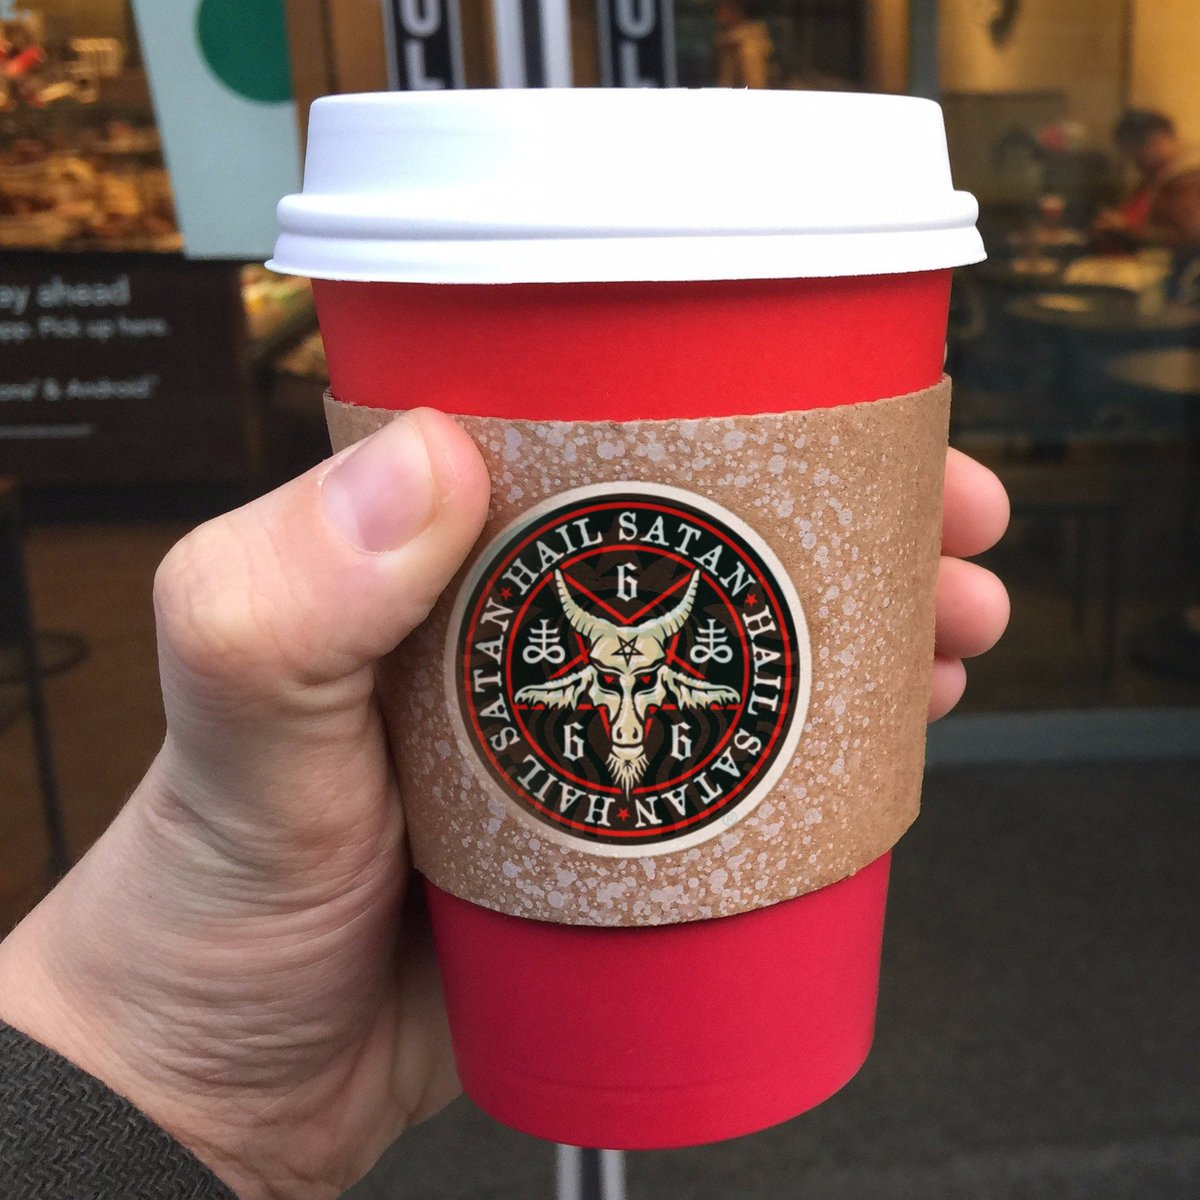 Okay, Starbucks, NOW you've gone too far. https://t.co/bYOVgxo91f